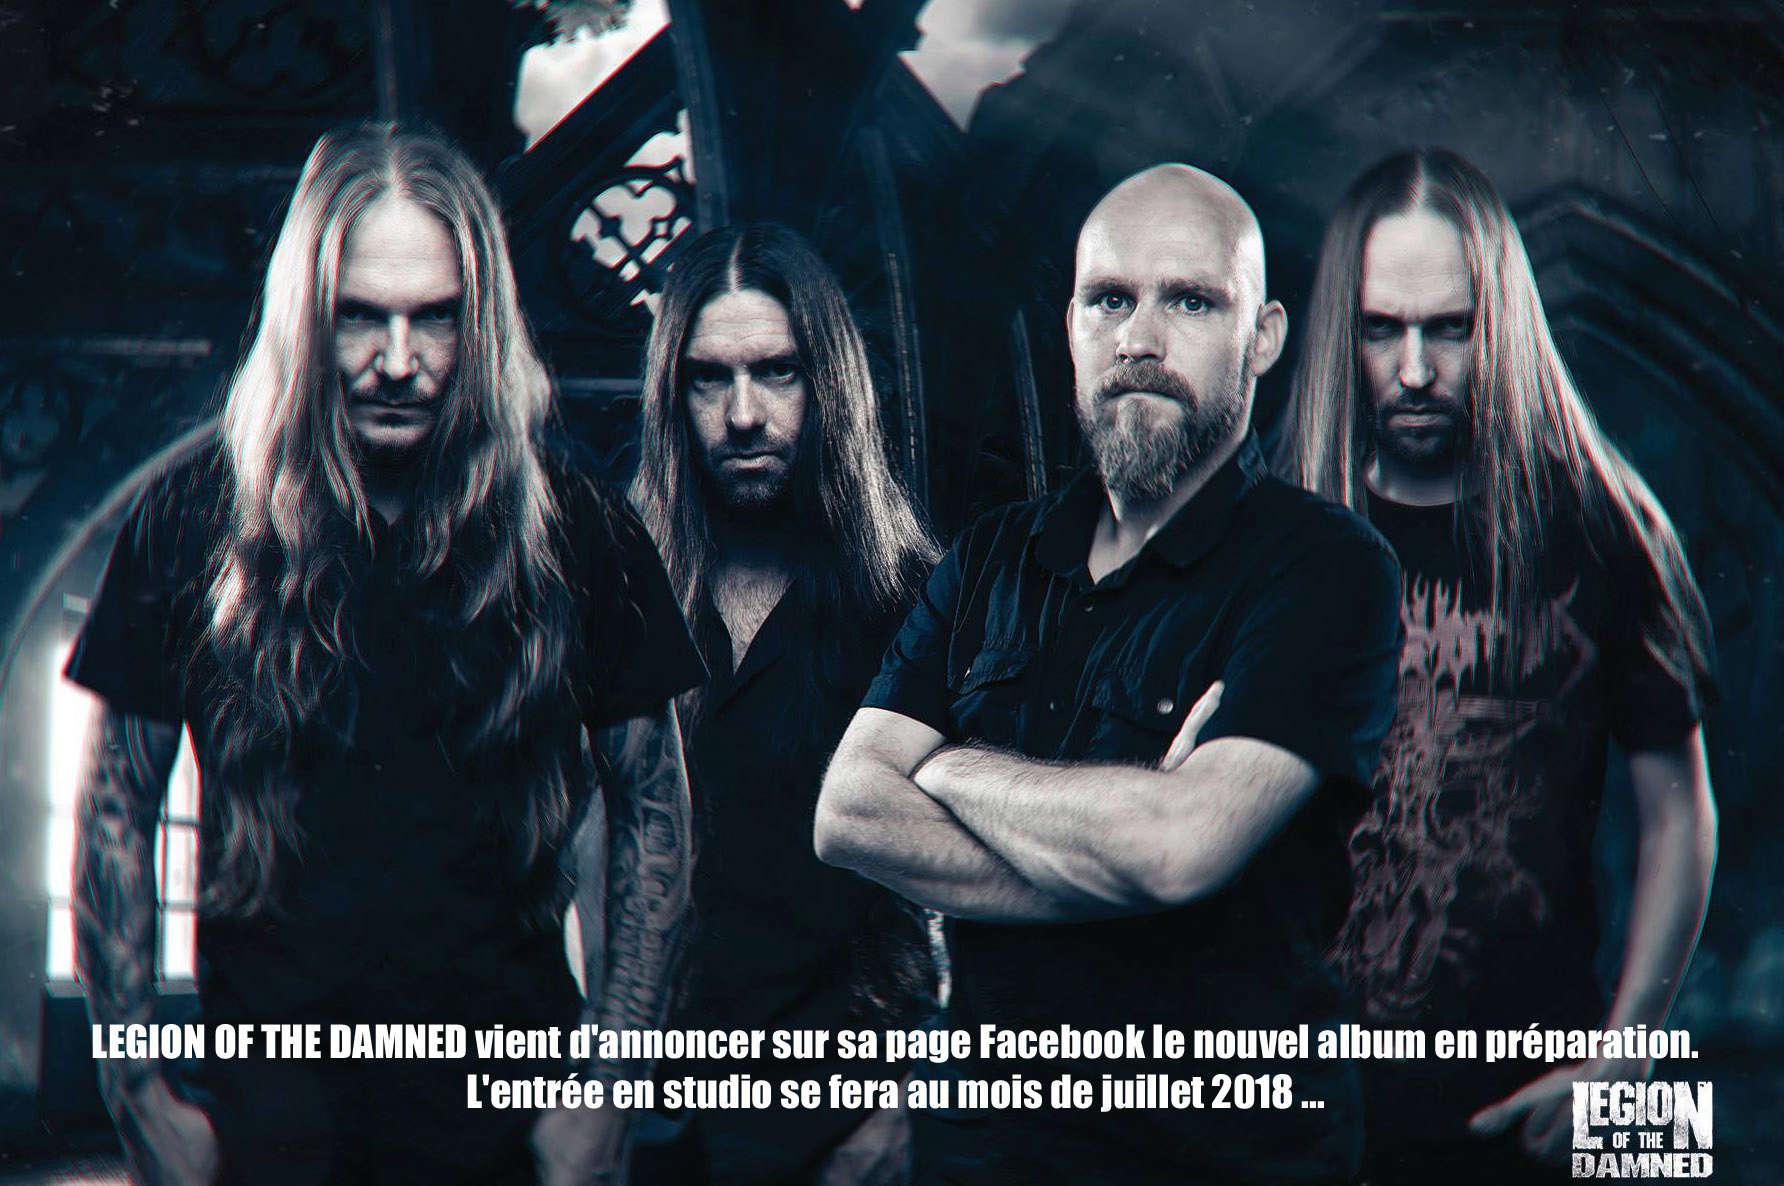 LEGION OF THE DAMNED annonce le nouvel album ... 25398110